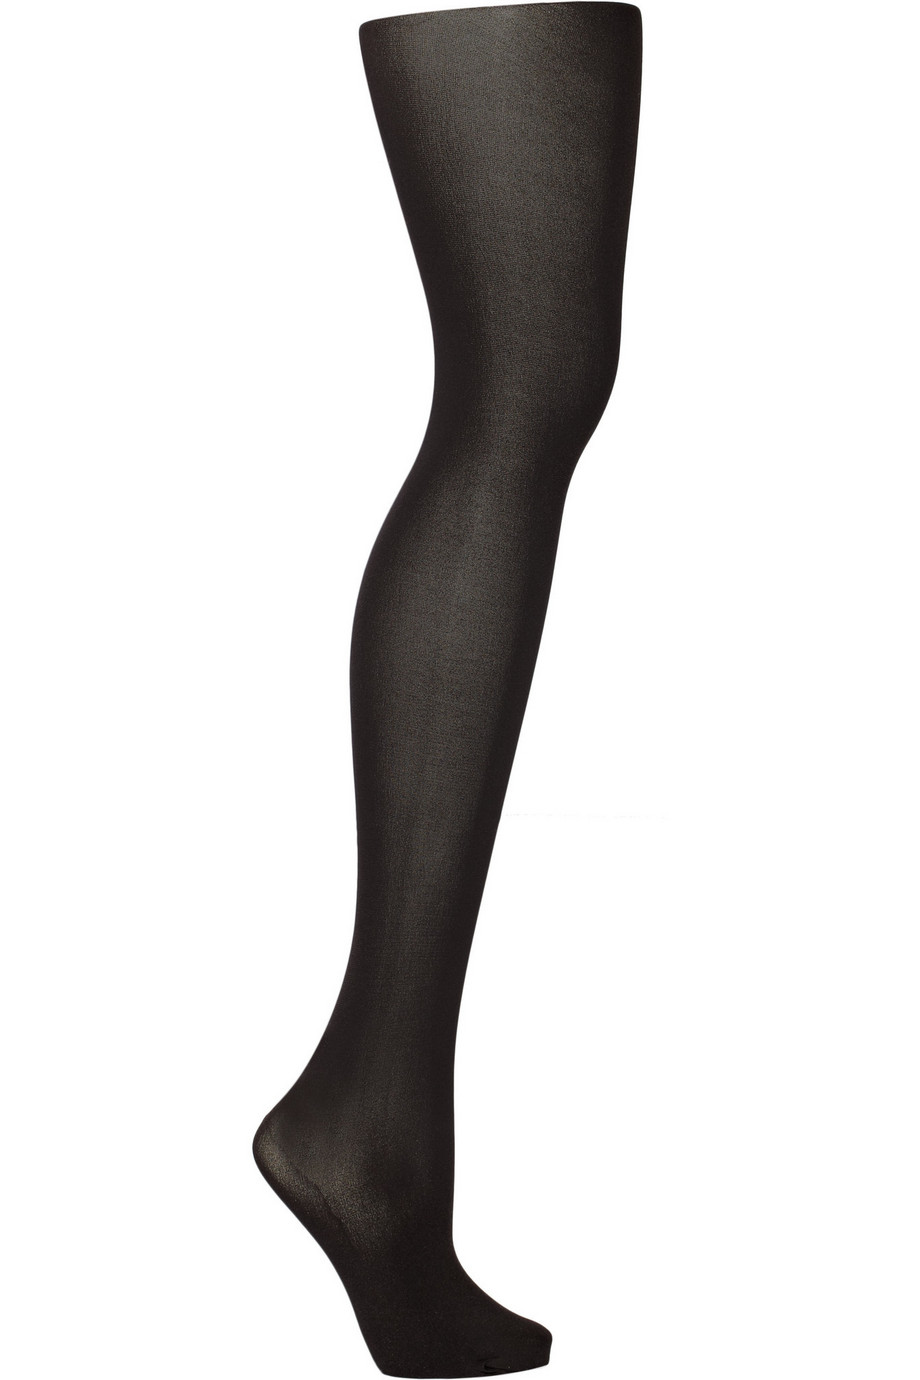 Spanx Haute Contour 50 Denier Shaping Tights, Black, Women's, Size: A